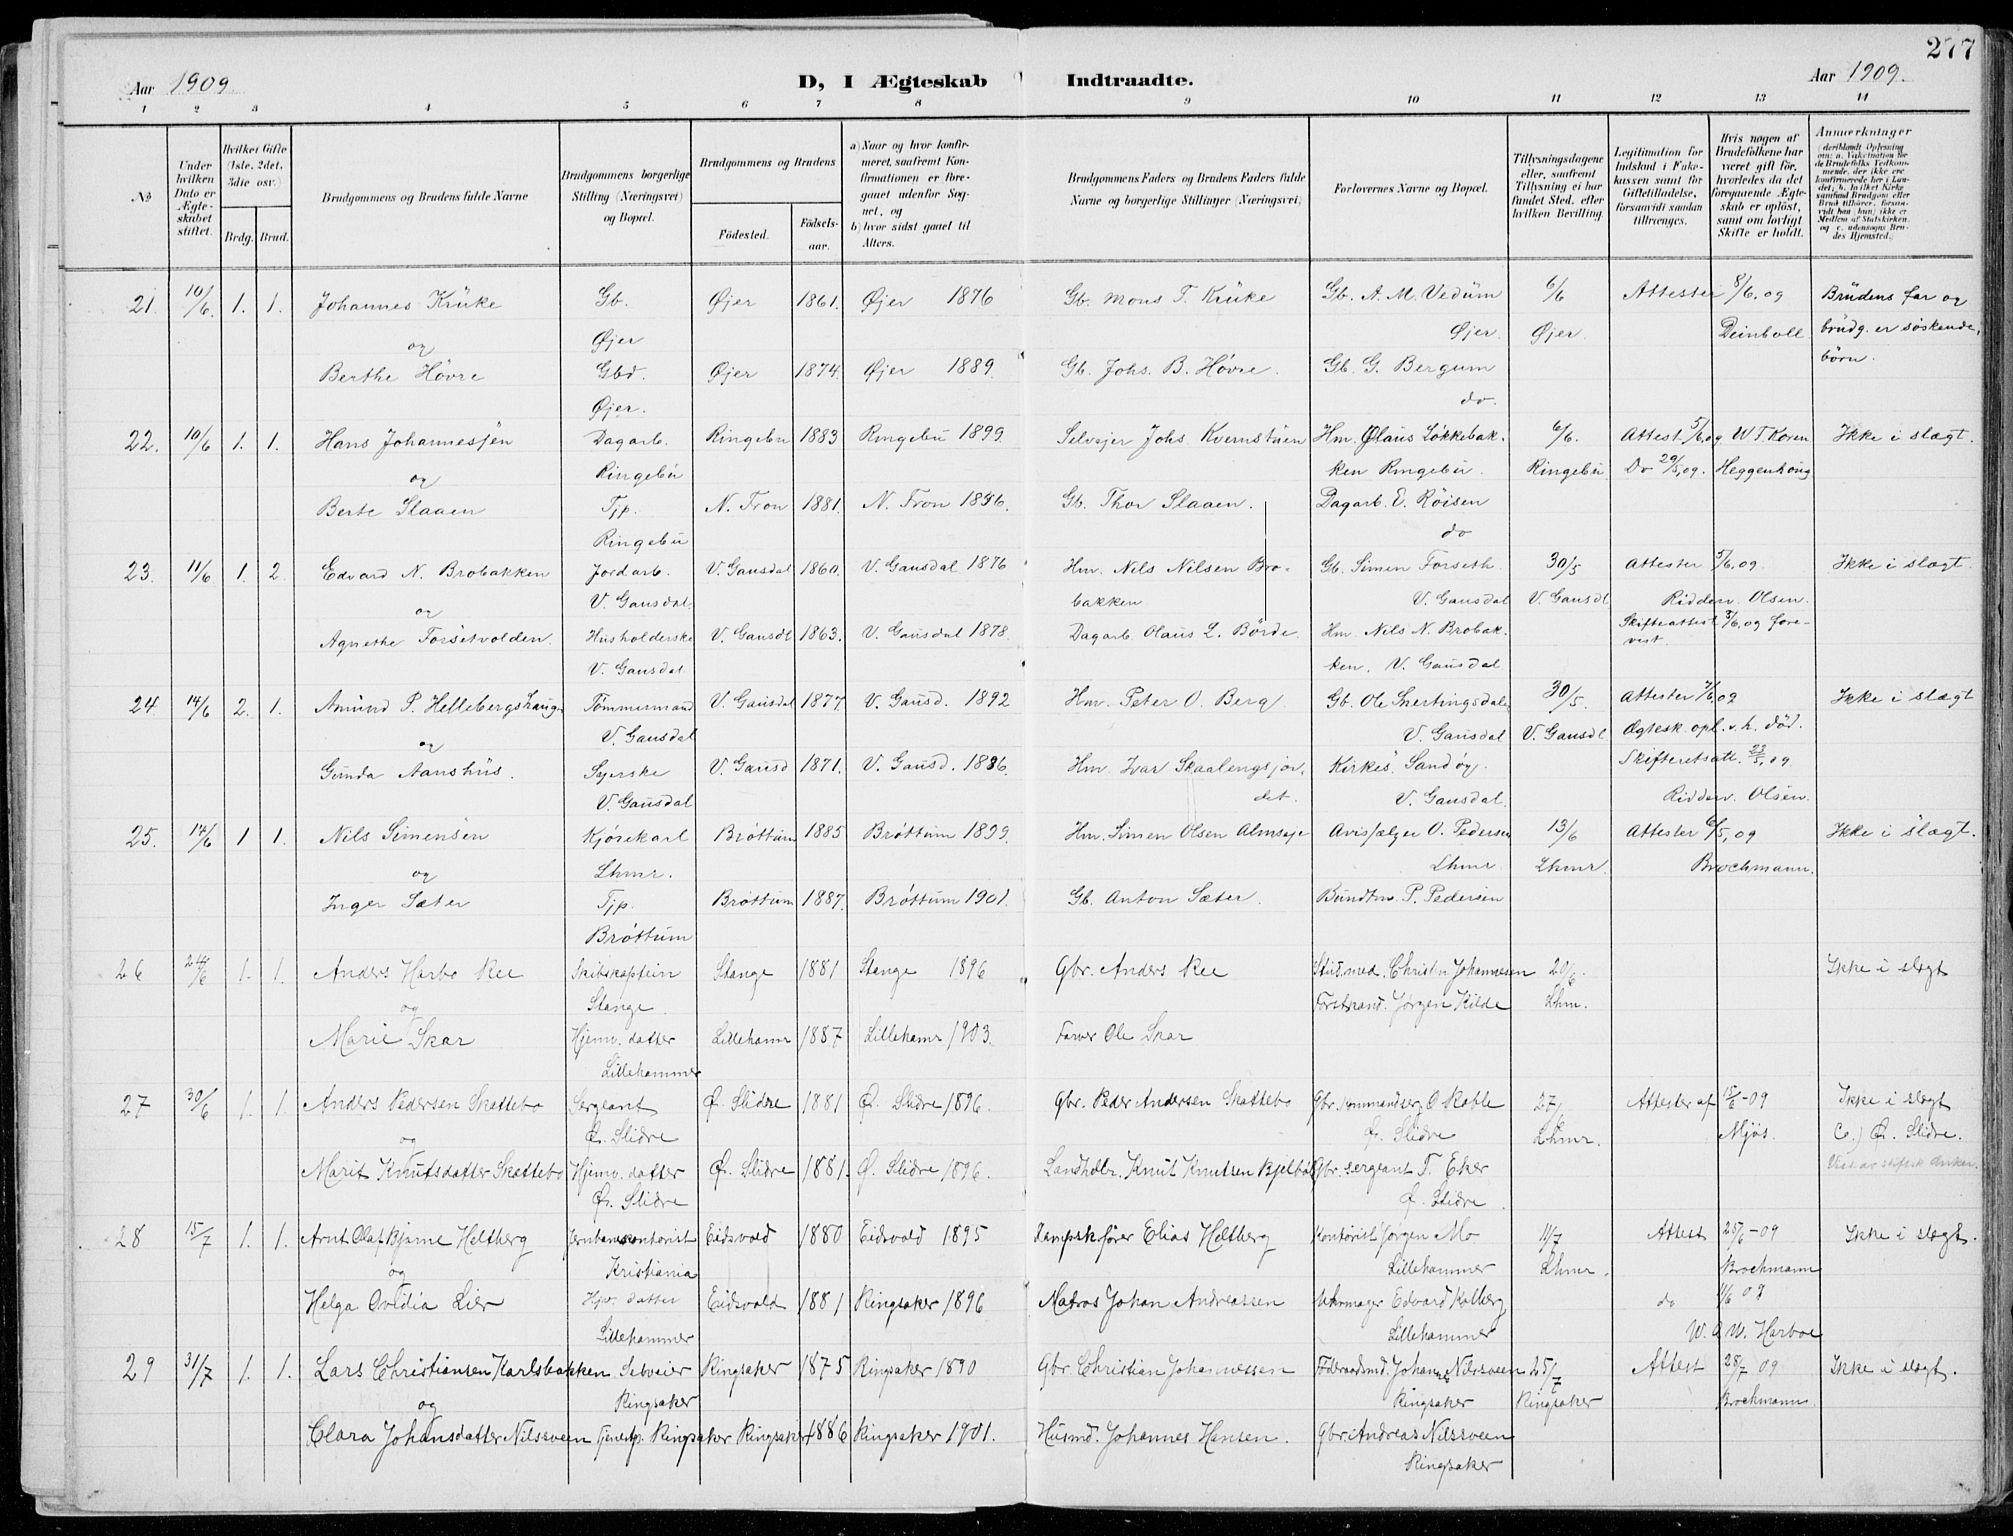 SAH, Lillehammer prestekontor, Ministerialbok nr. 1, 1901-1916, s. 277